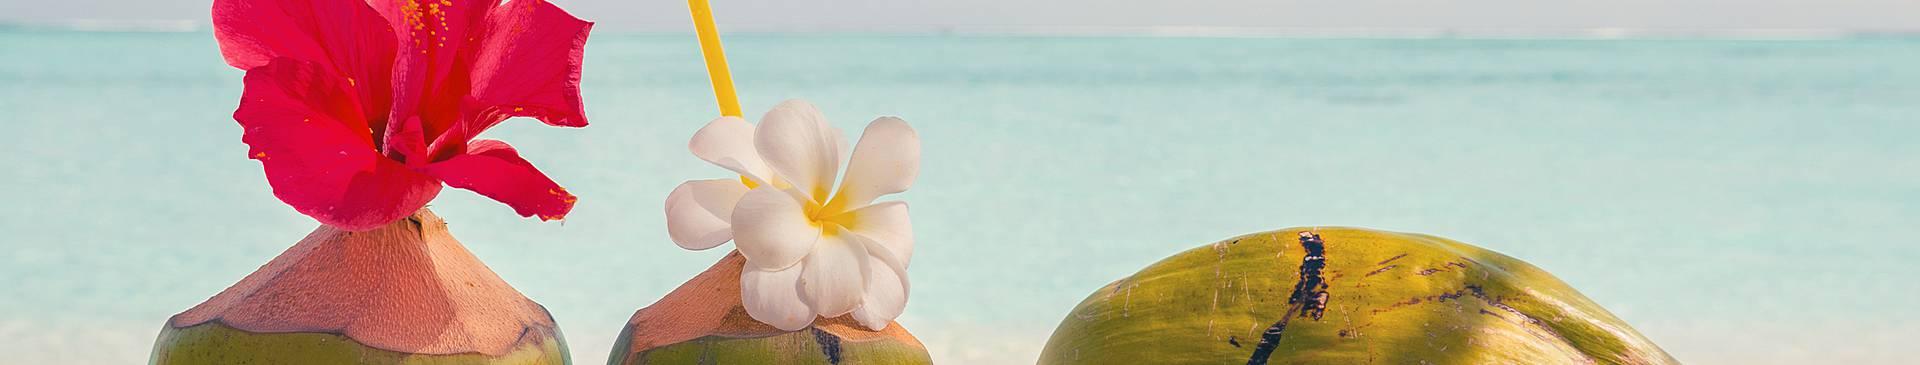 Maldives Honeymoon Vacations